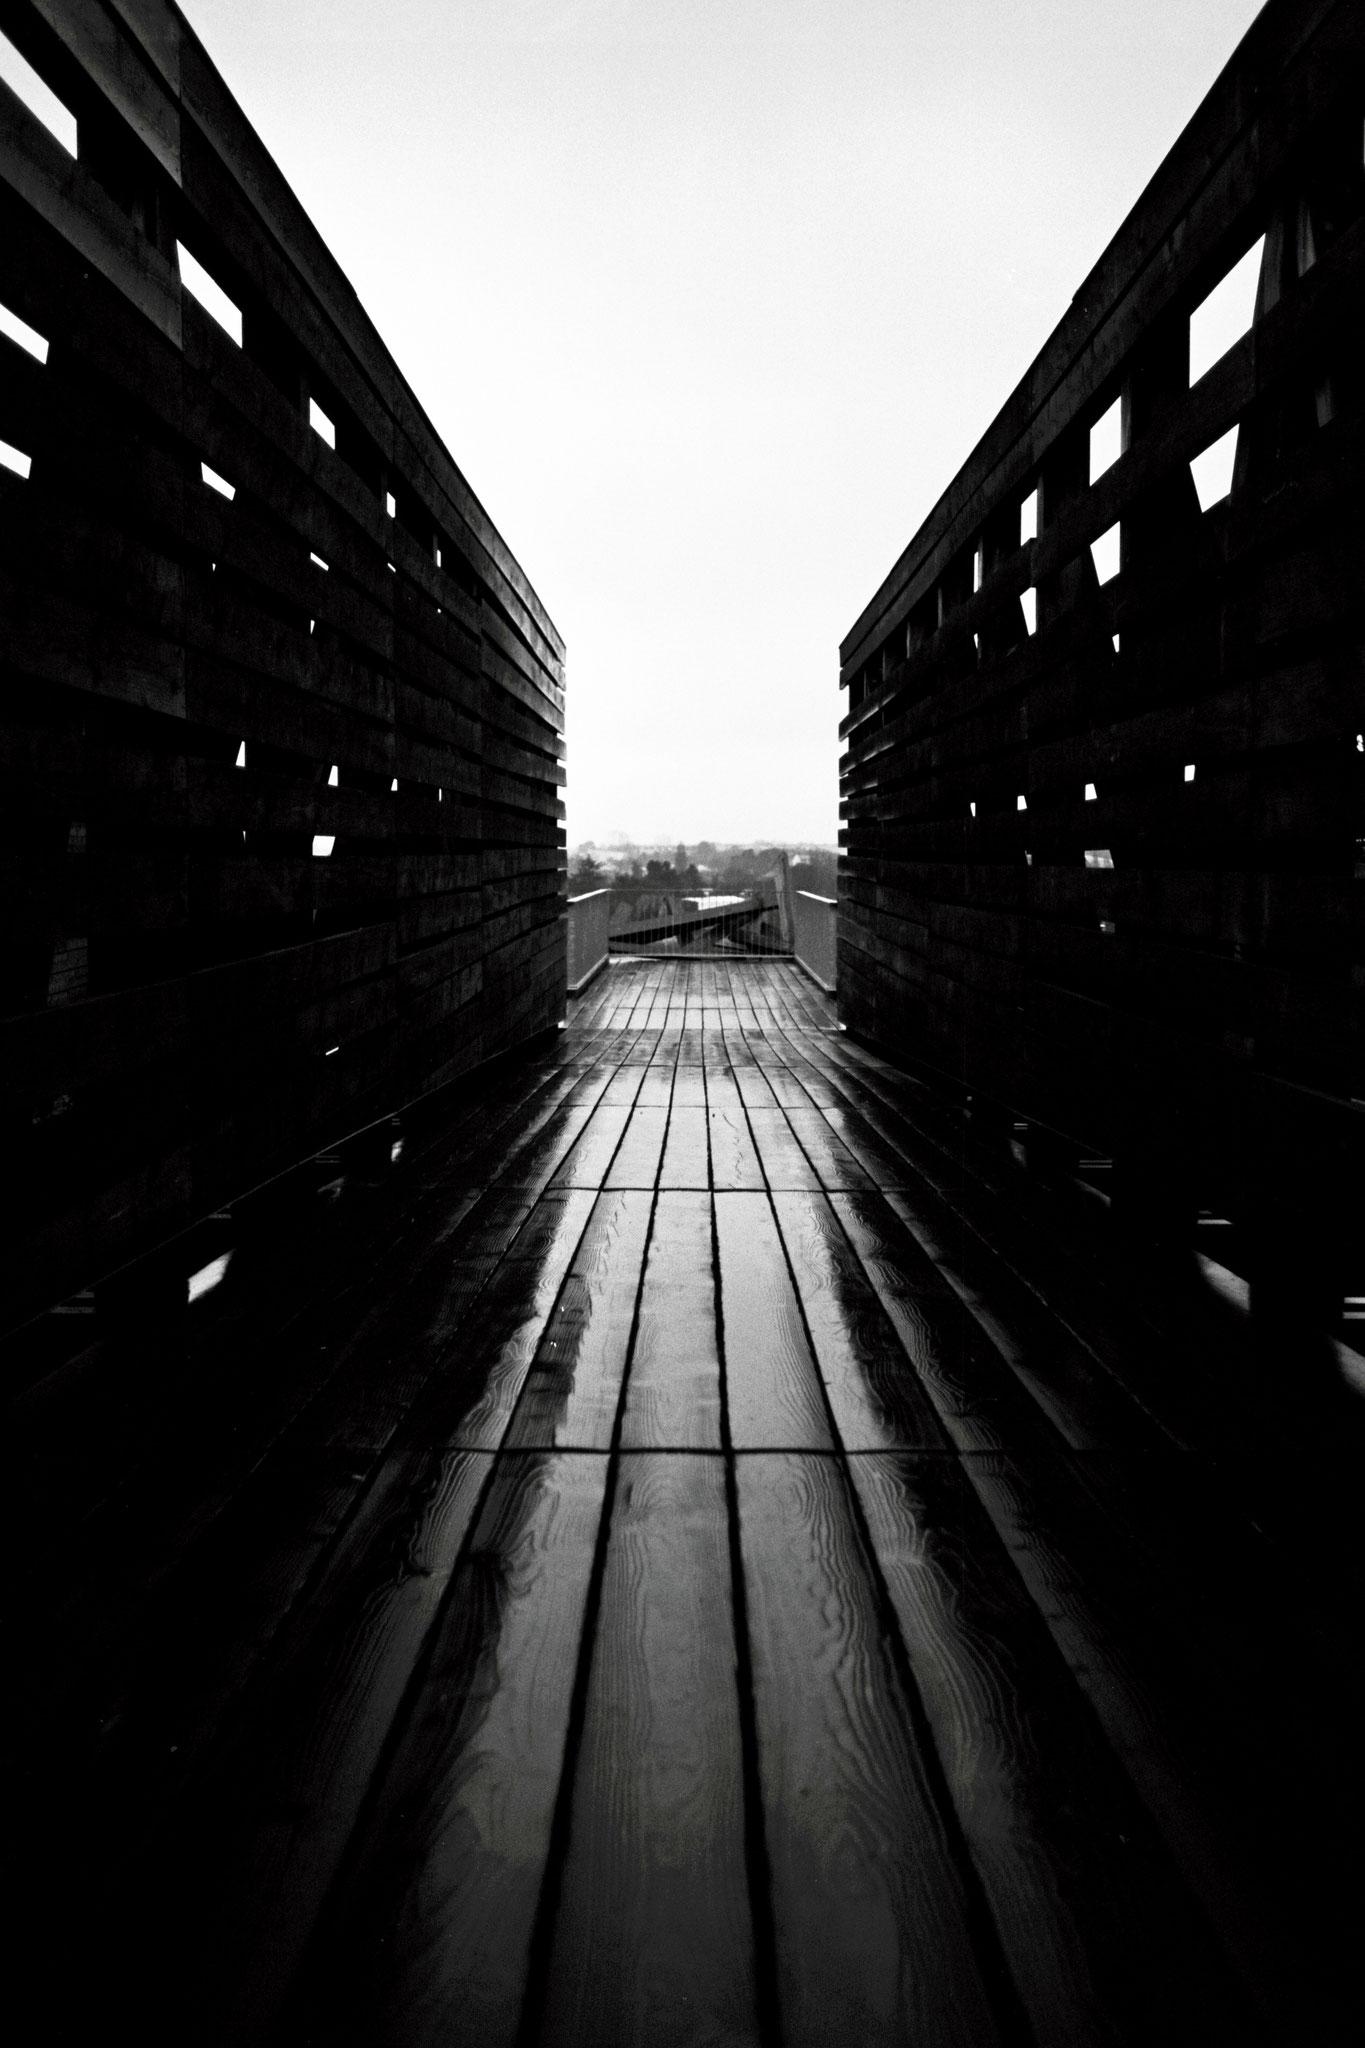 """Bridge with view"" - Nantes (2021). Rollei Blackbird Creative 64 ASA. © Clémence Rougetet"